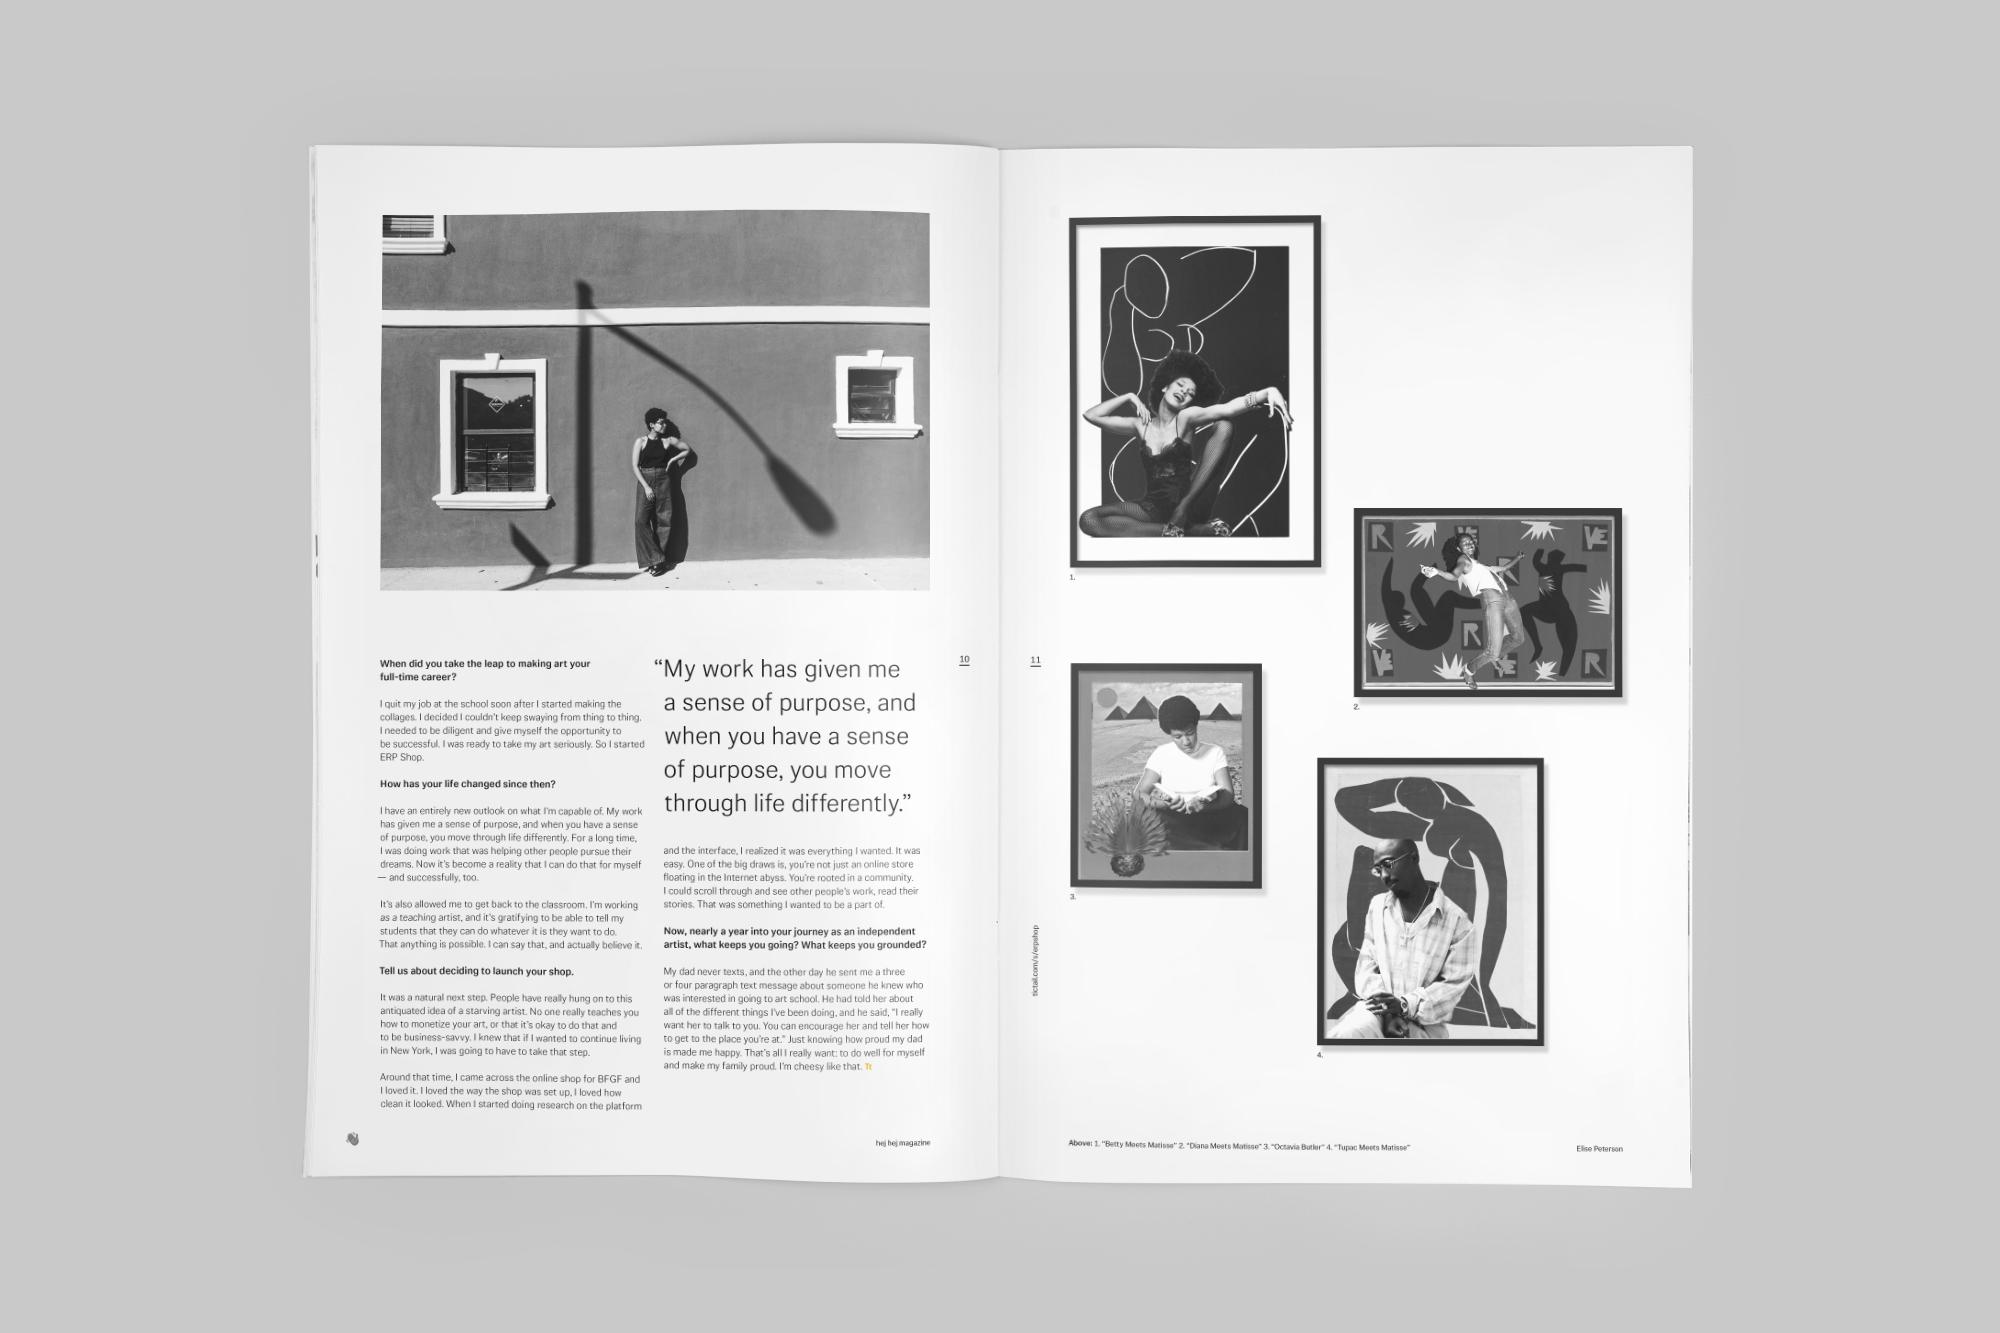 Tictail_Hejhej_Magazine_0005_Spread 05.jpg